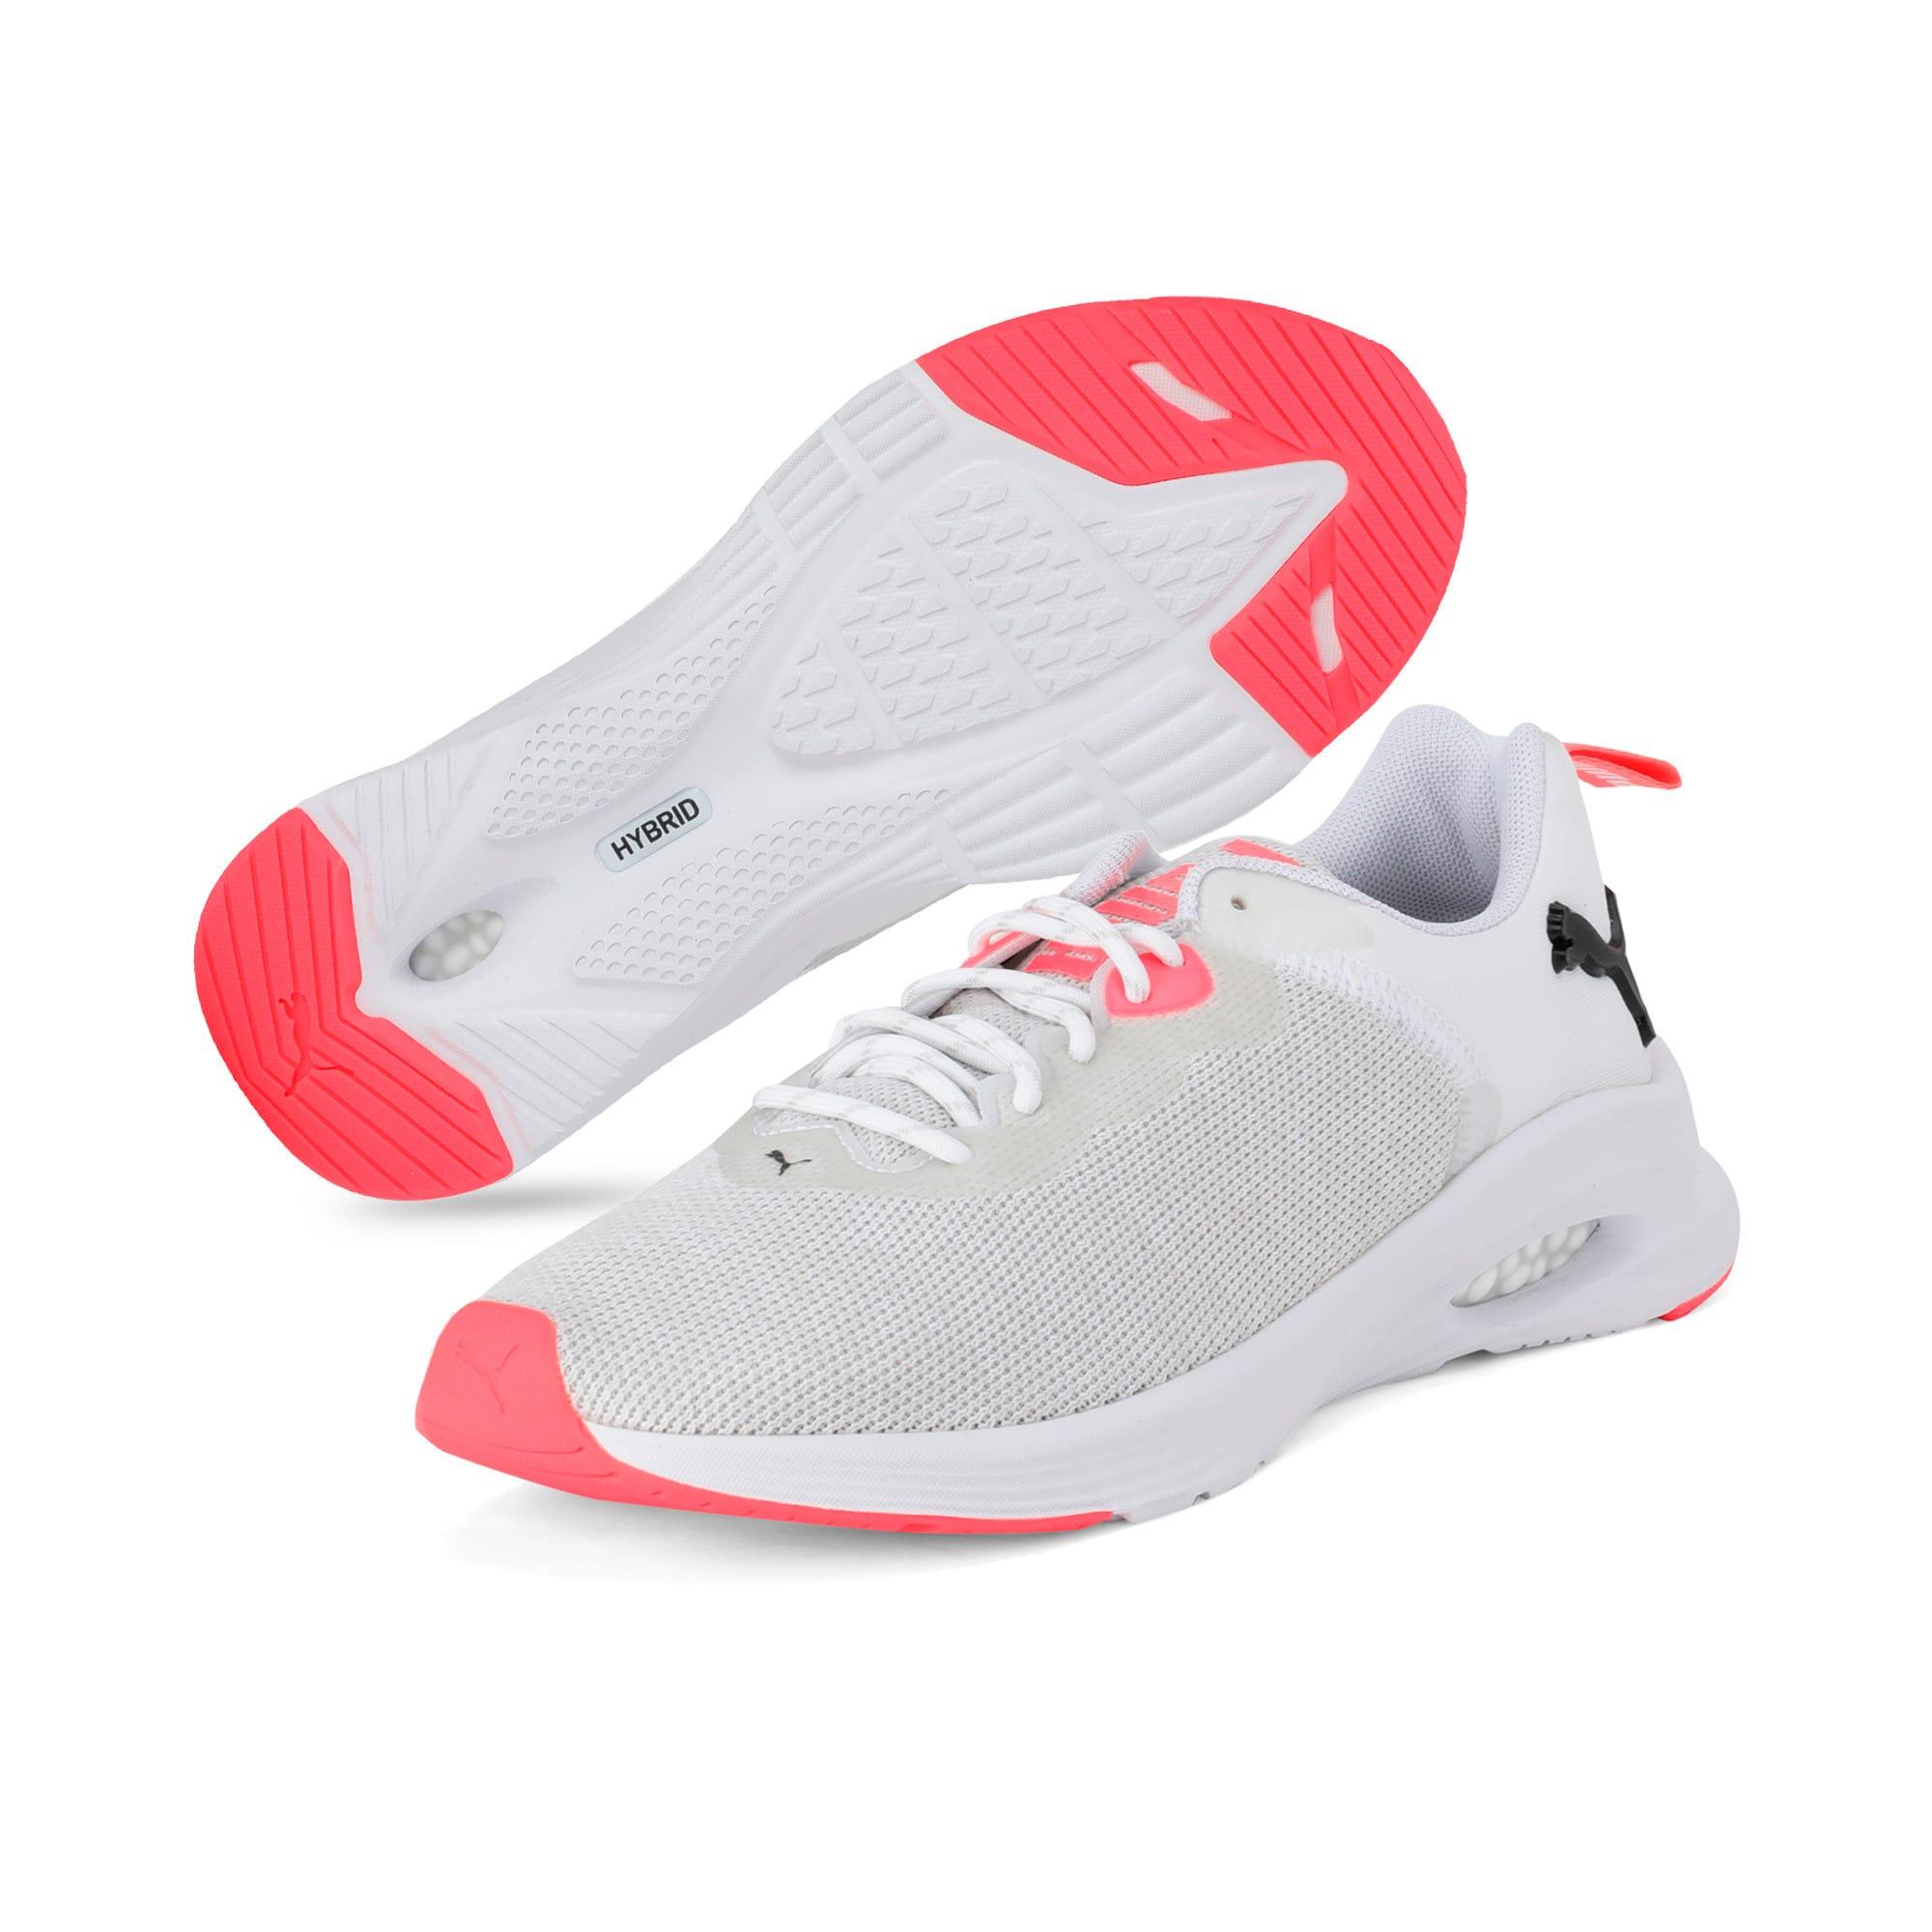 Thumbnail 2 of HYBRID Fuego Knit Women's Running Shoes, Puma White-Pnk Alert-Pma Blk, medium-IND